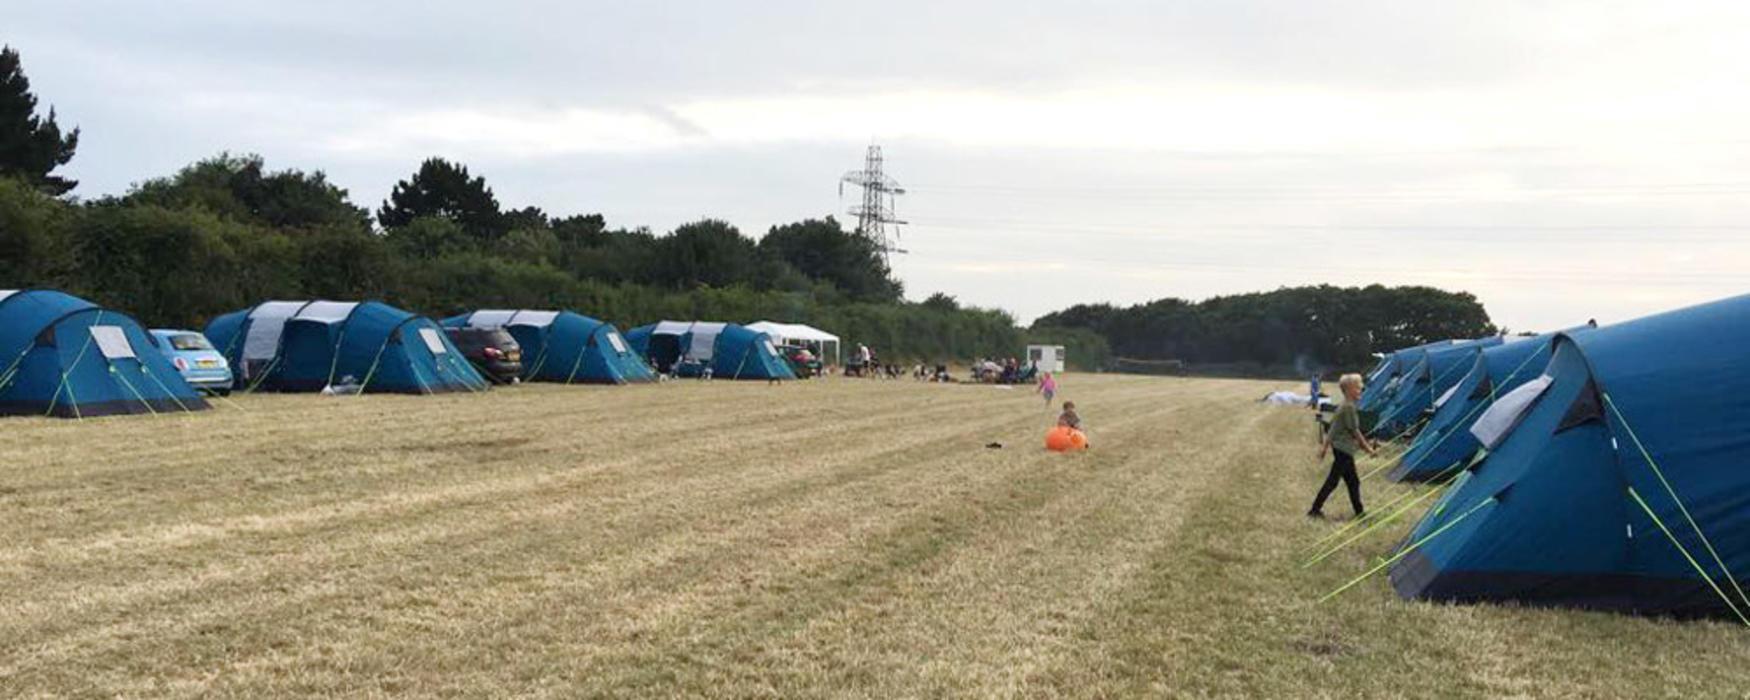 & Pre-erected Tents | Lepe Meadows